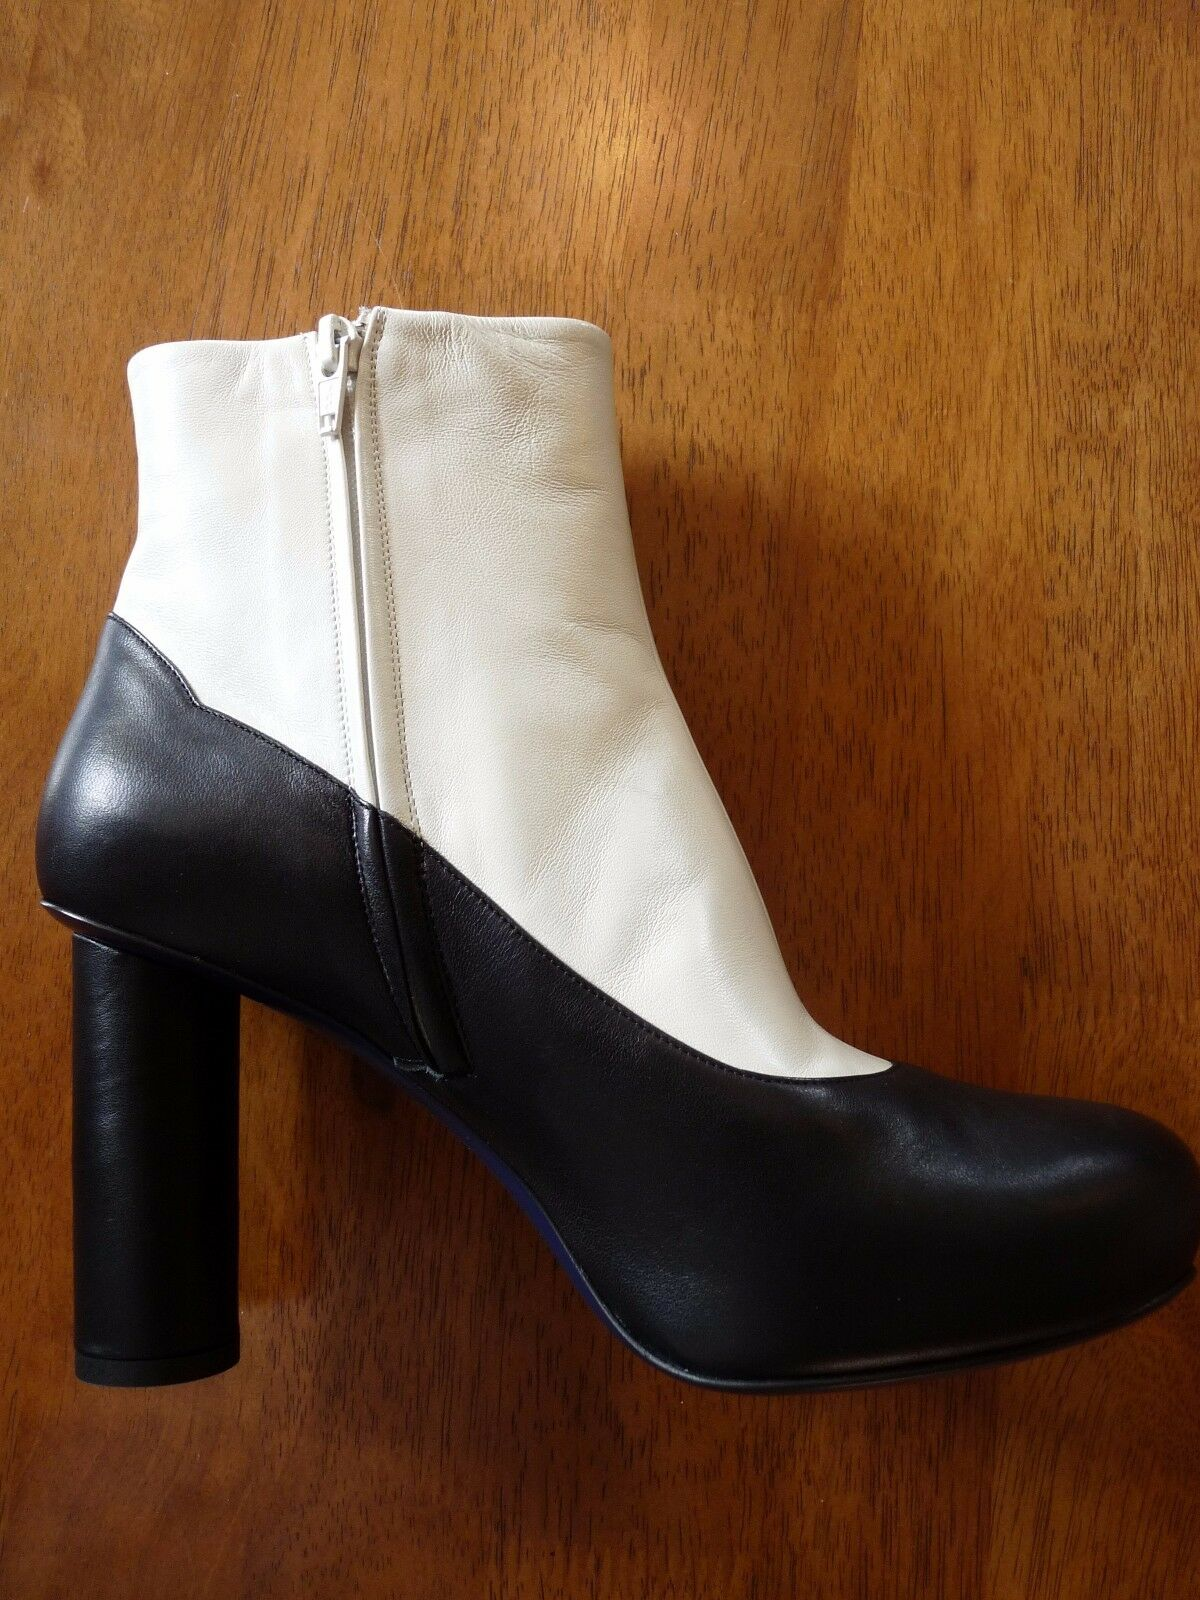 Grandes zapatos con descuento Sonia Rykiel High Heel Black & White Leather Ankle Boots  EU 40   469   BNIB